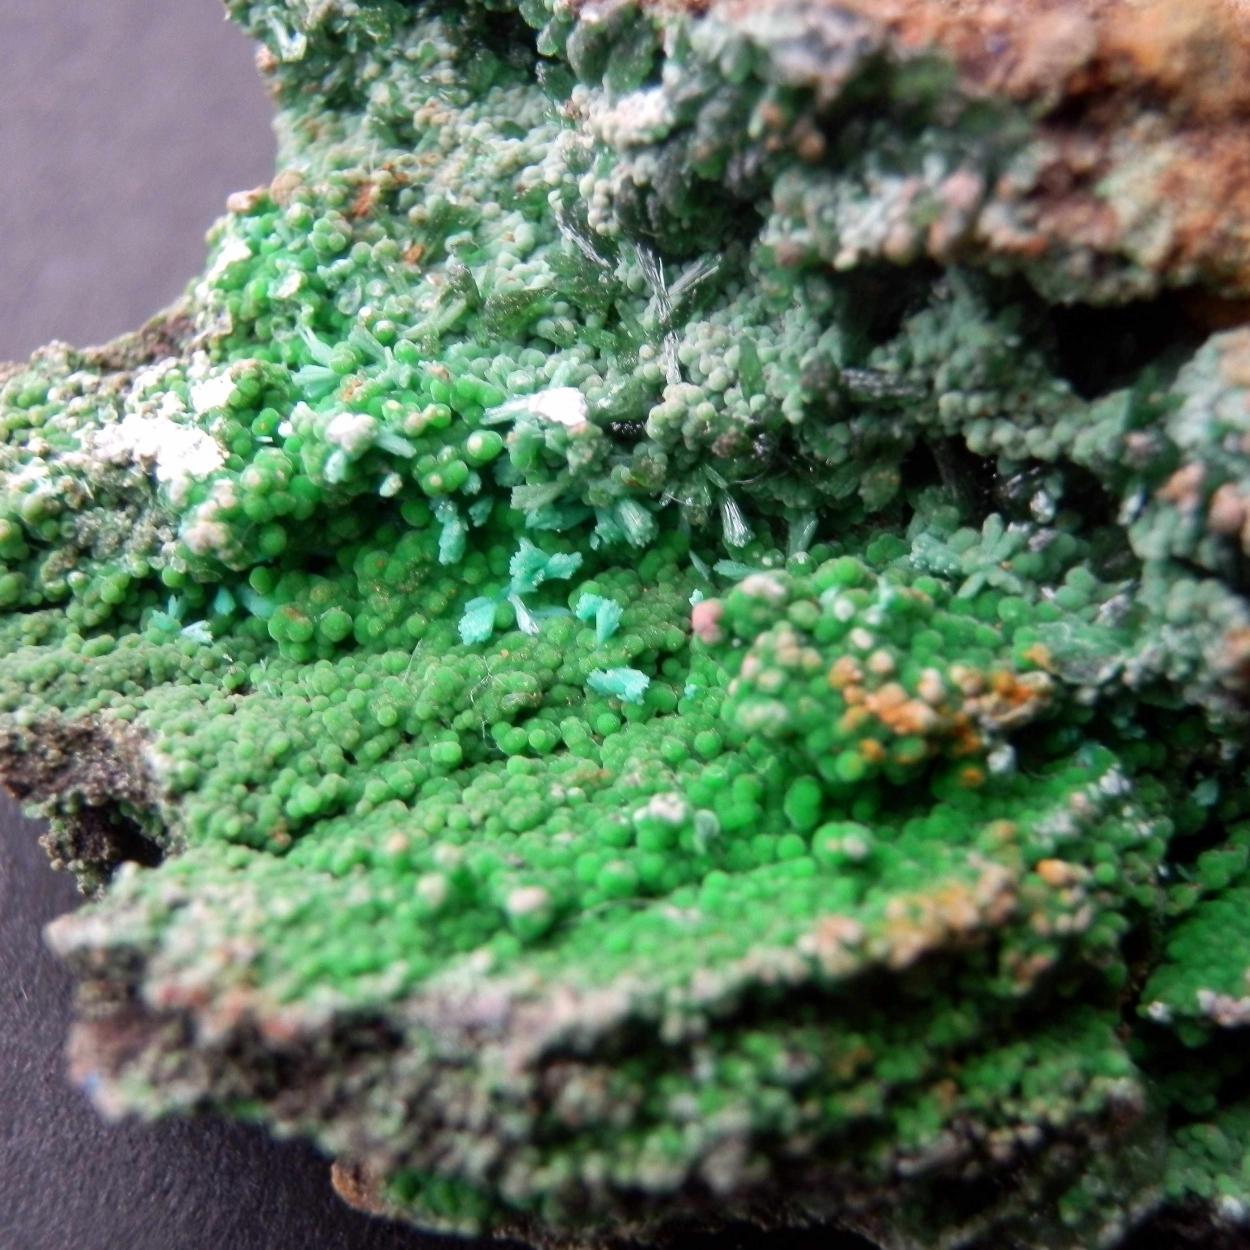 Brochantite & Conichalcite